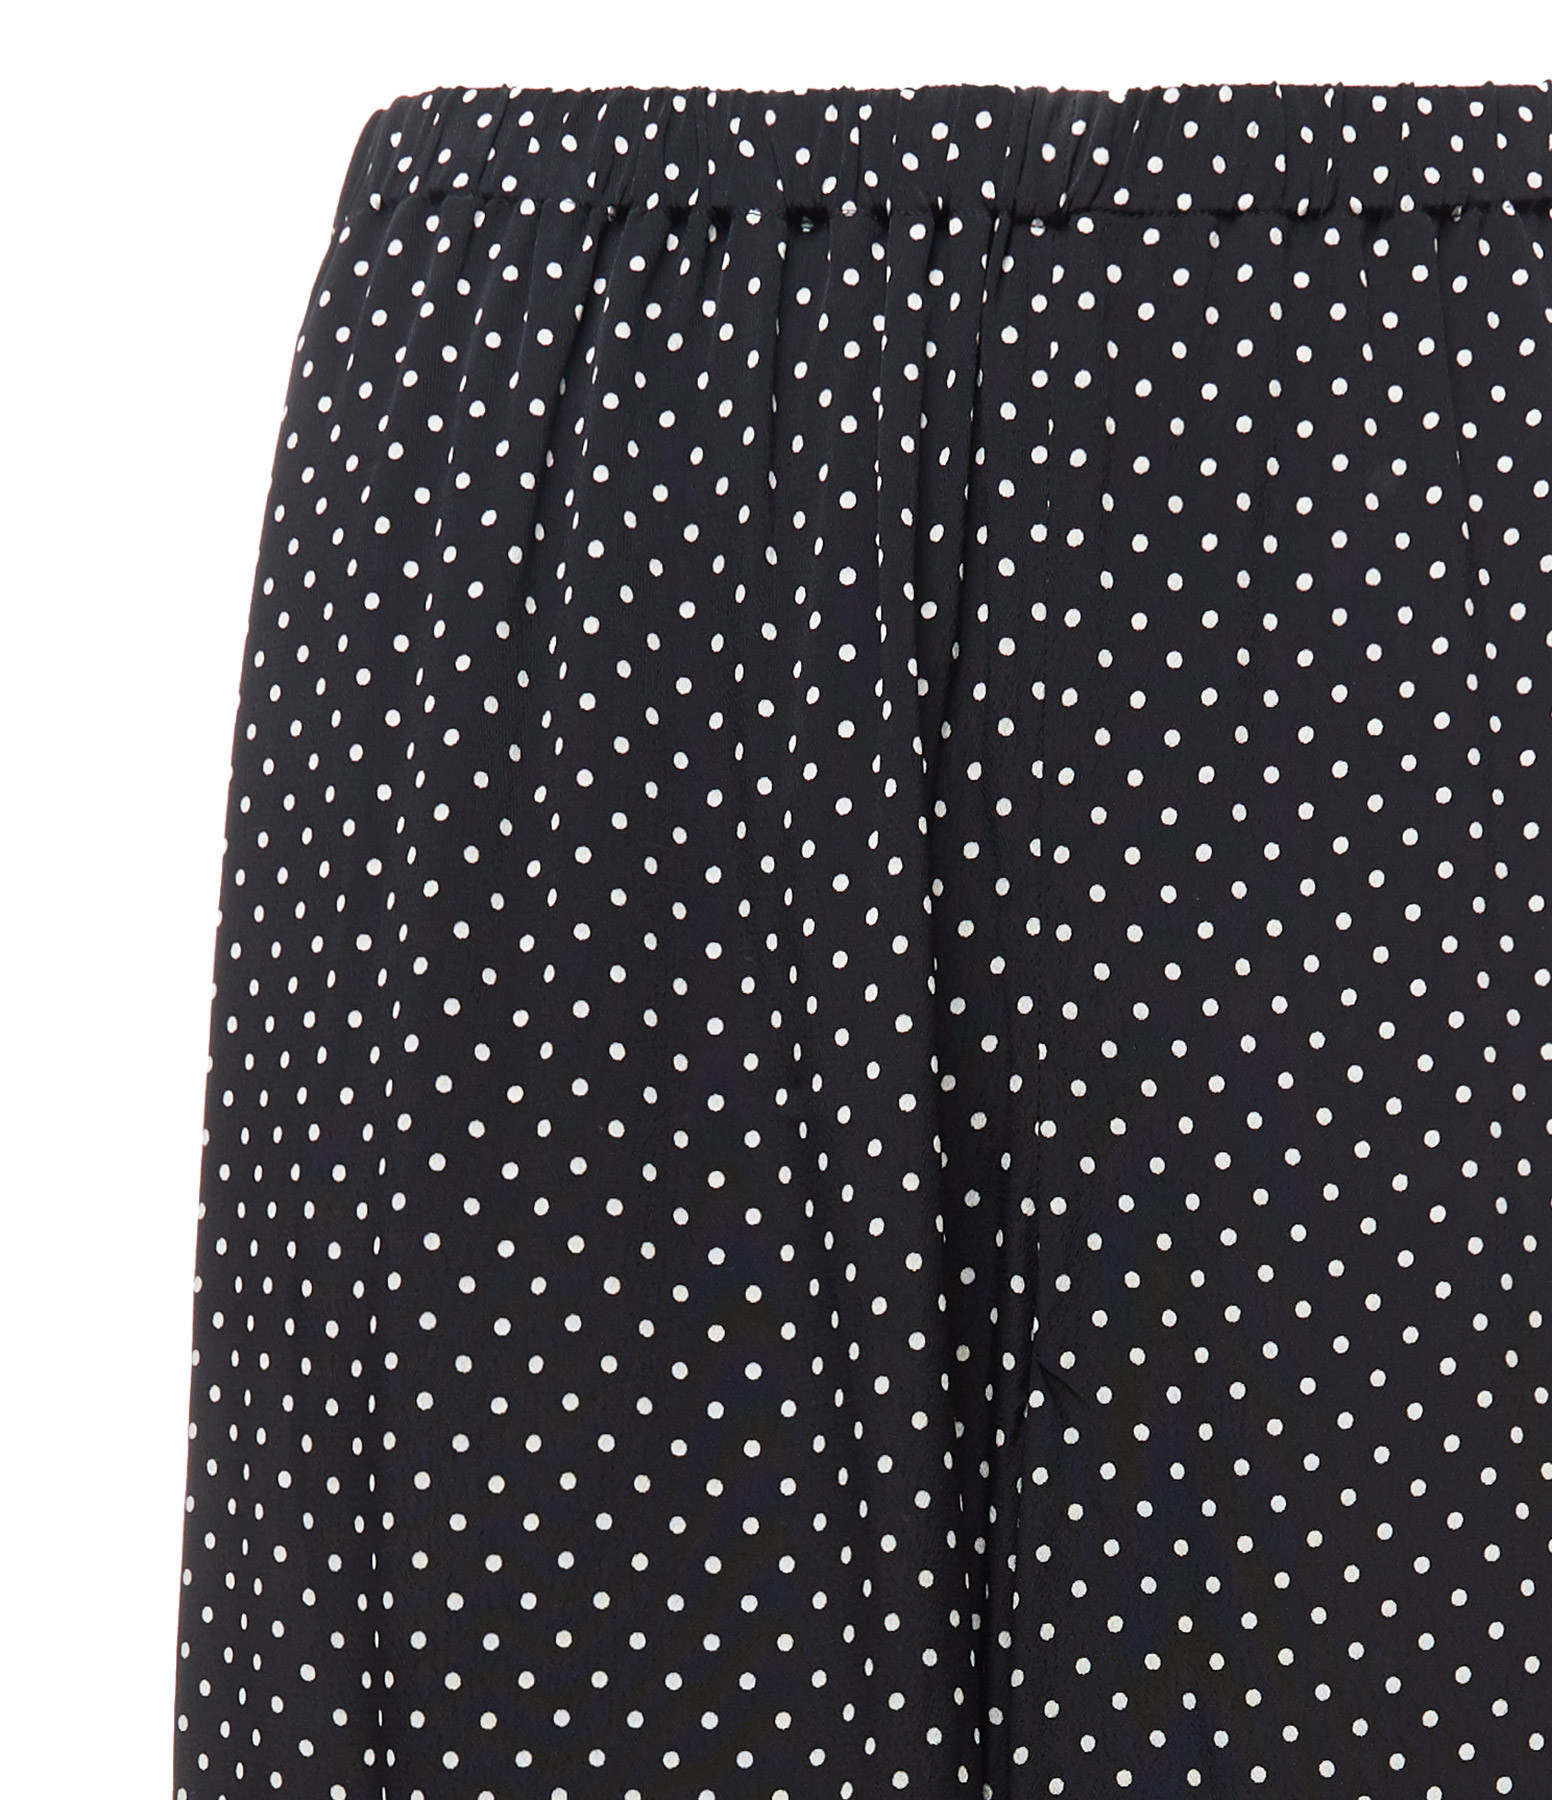 THEORY - Pantalon Fluide Pois Noir